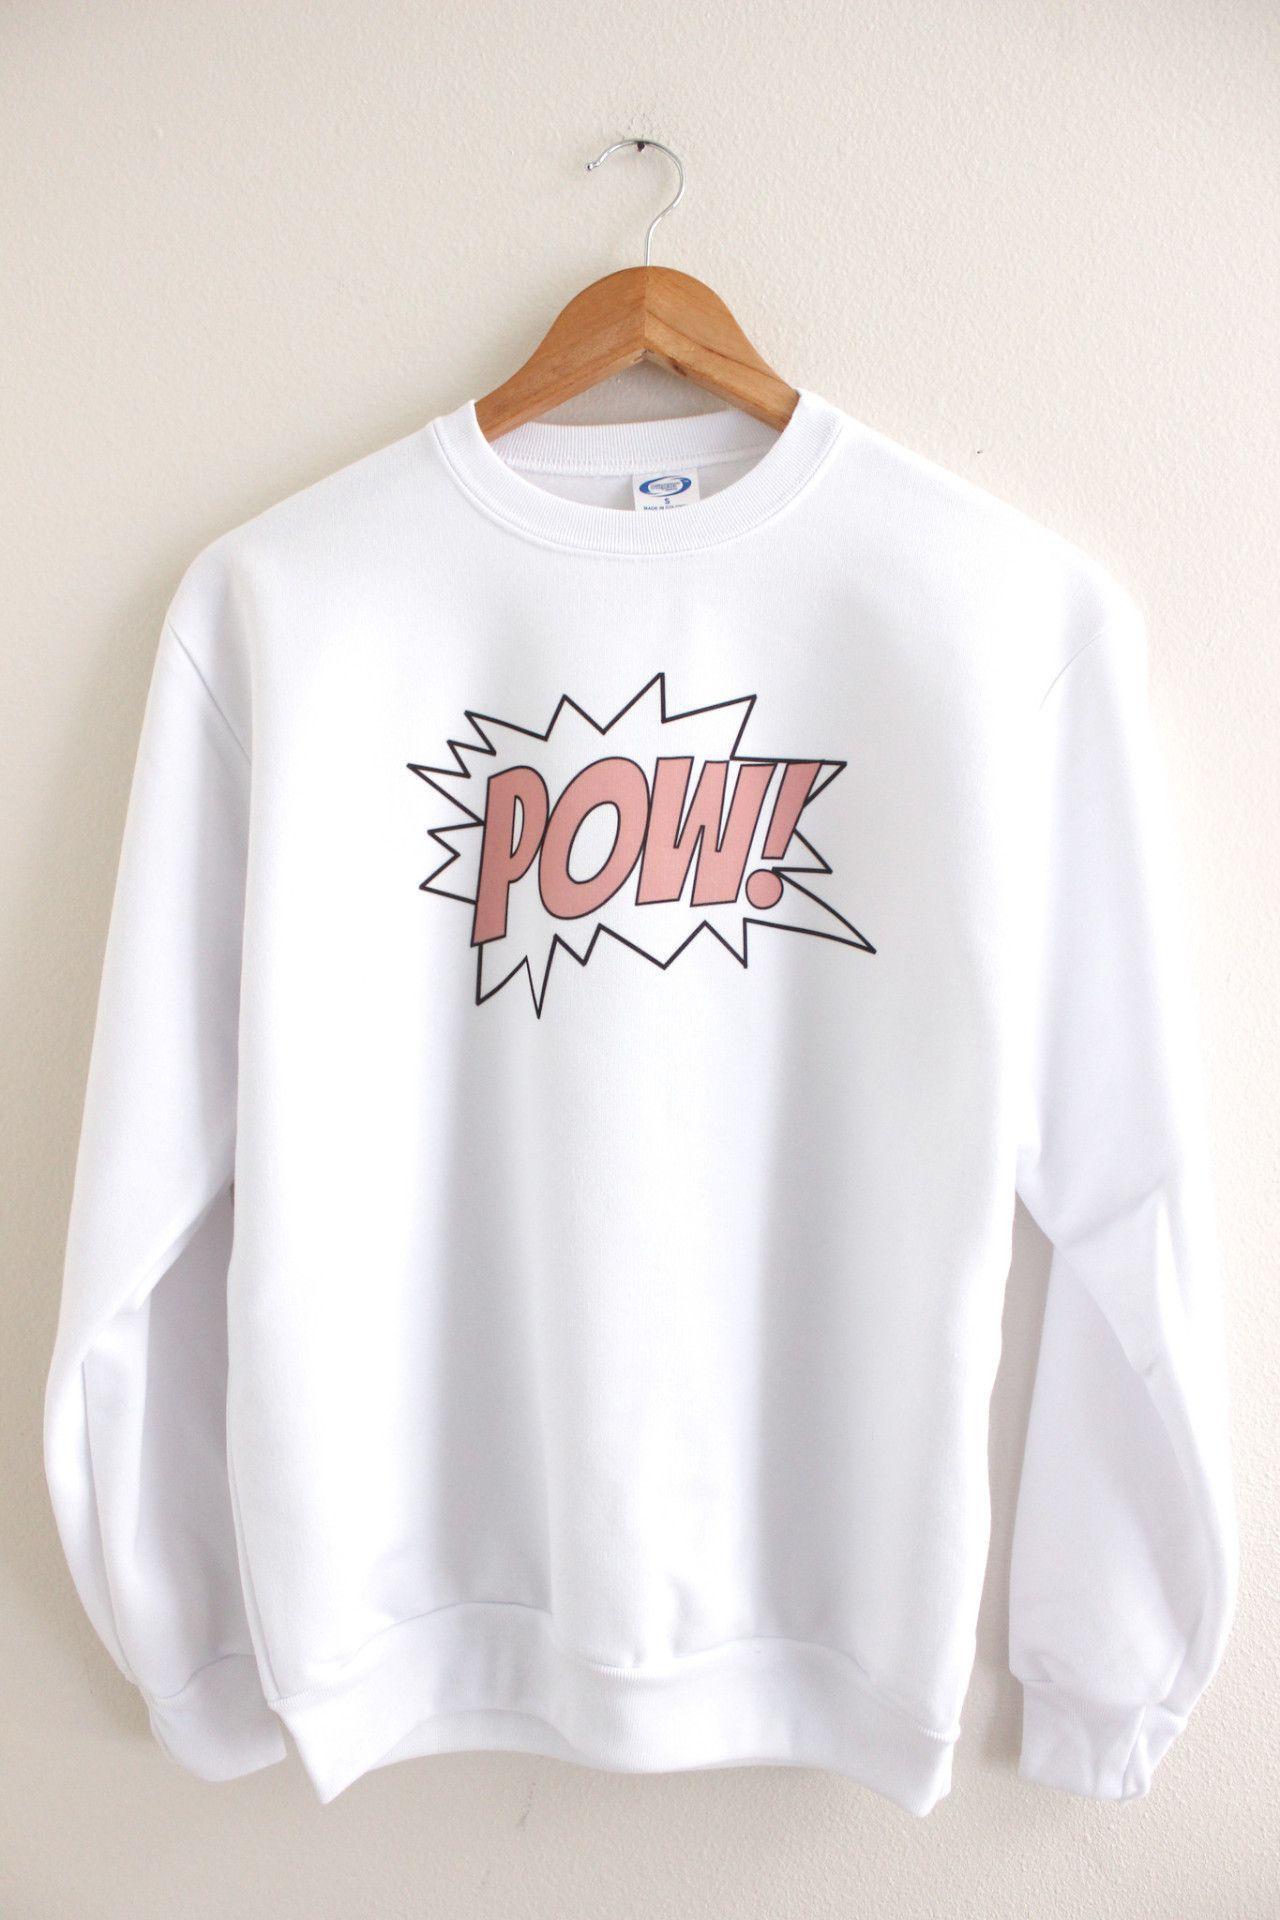 aa77f11509d4 Pink POW Graphic Crewneck Sweatshirt Graphic Sweatshirt